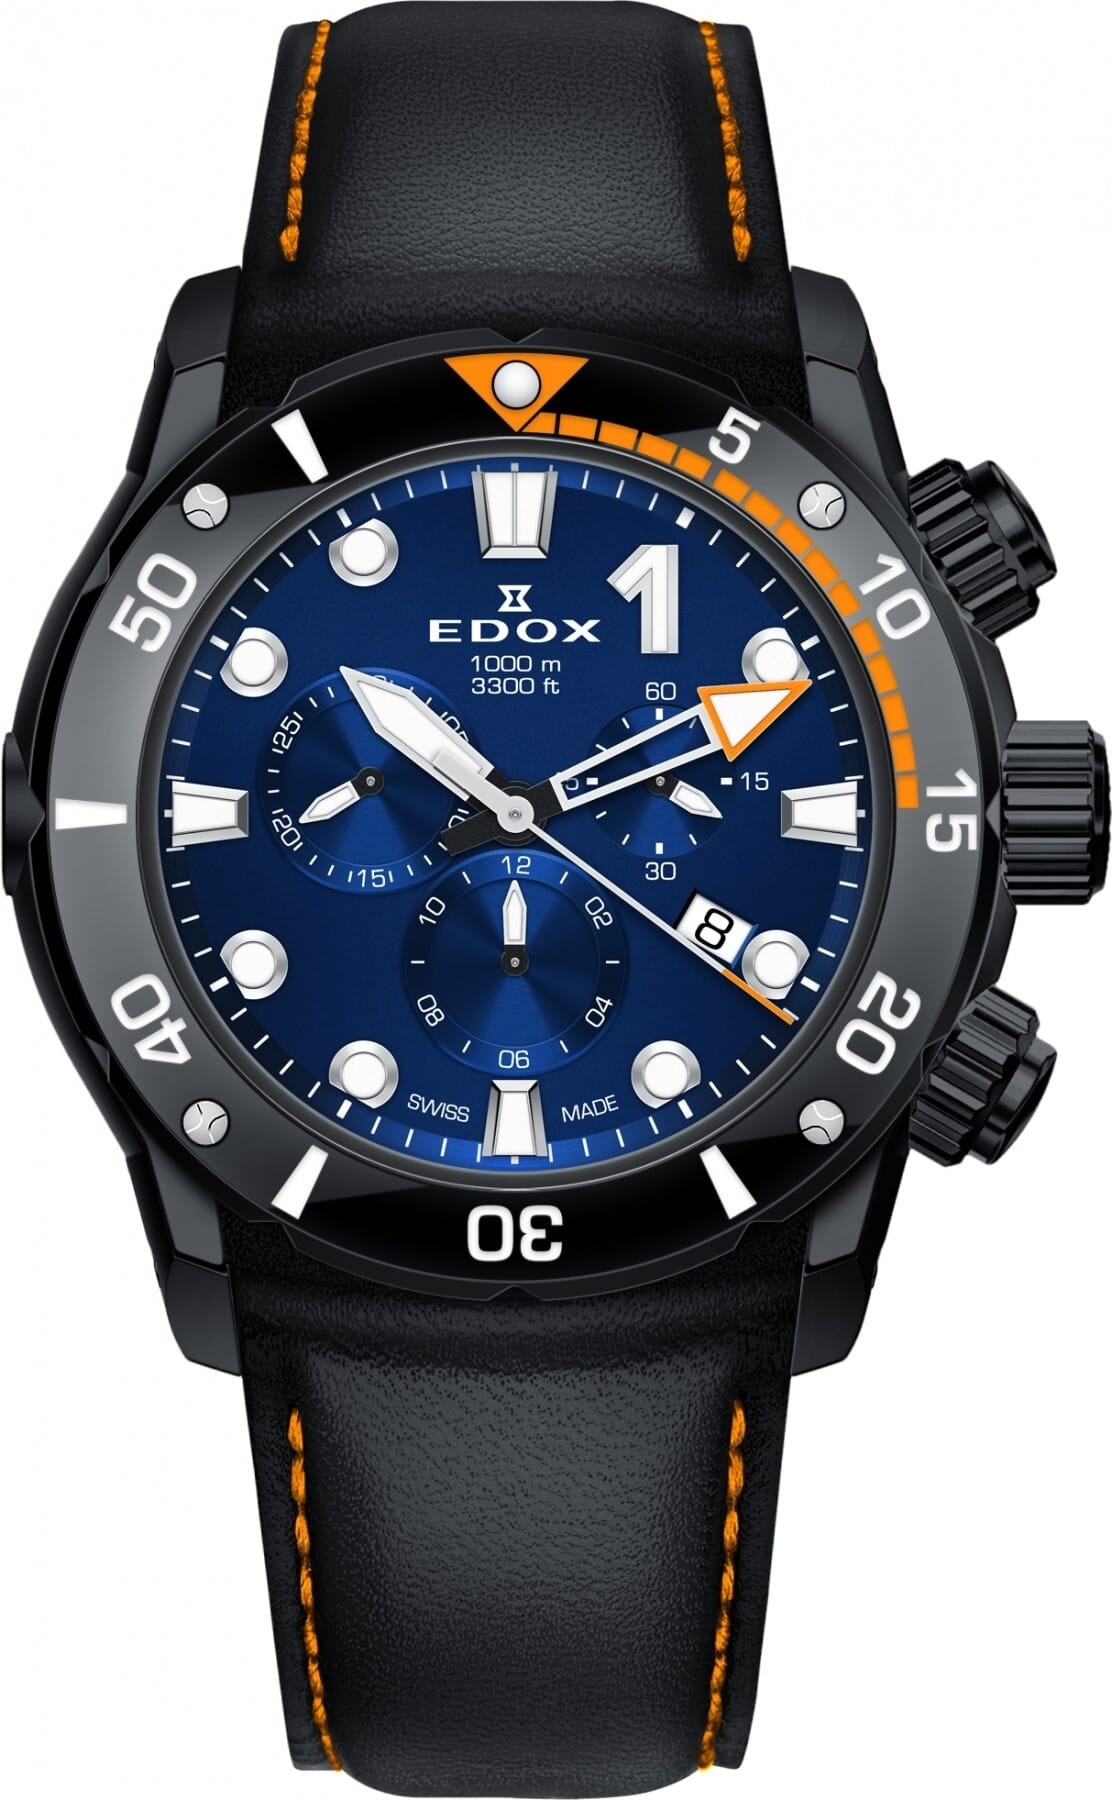 Edox 10242 TINNO BUIN